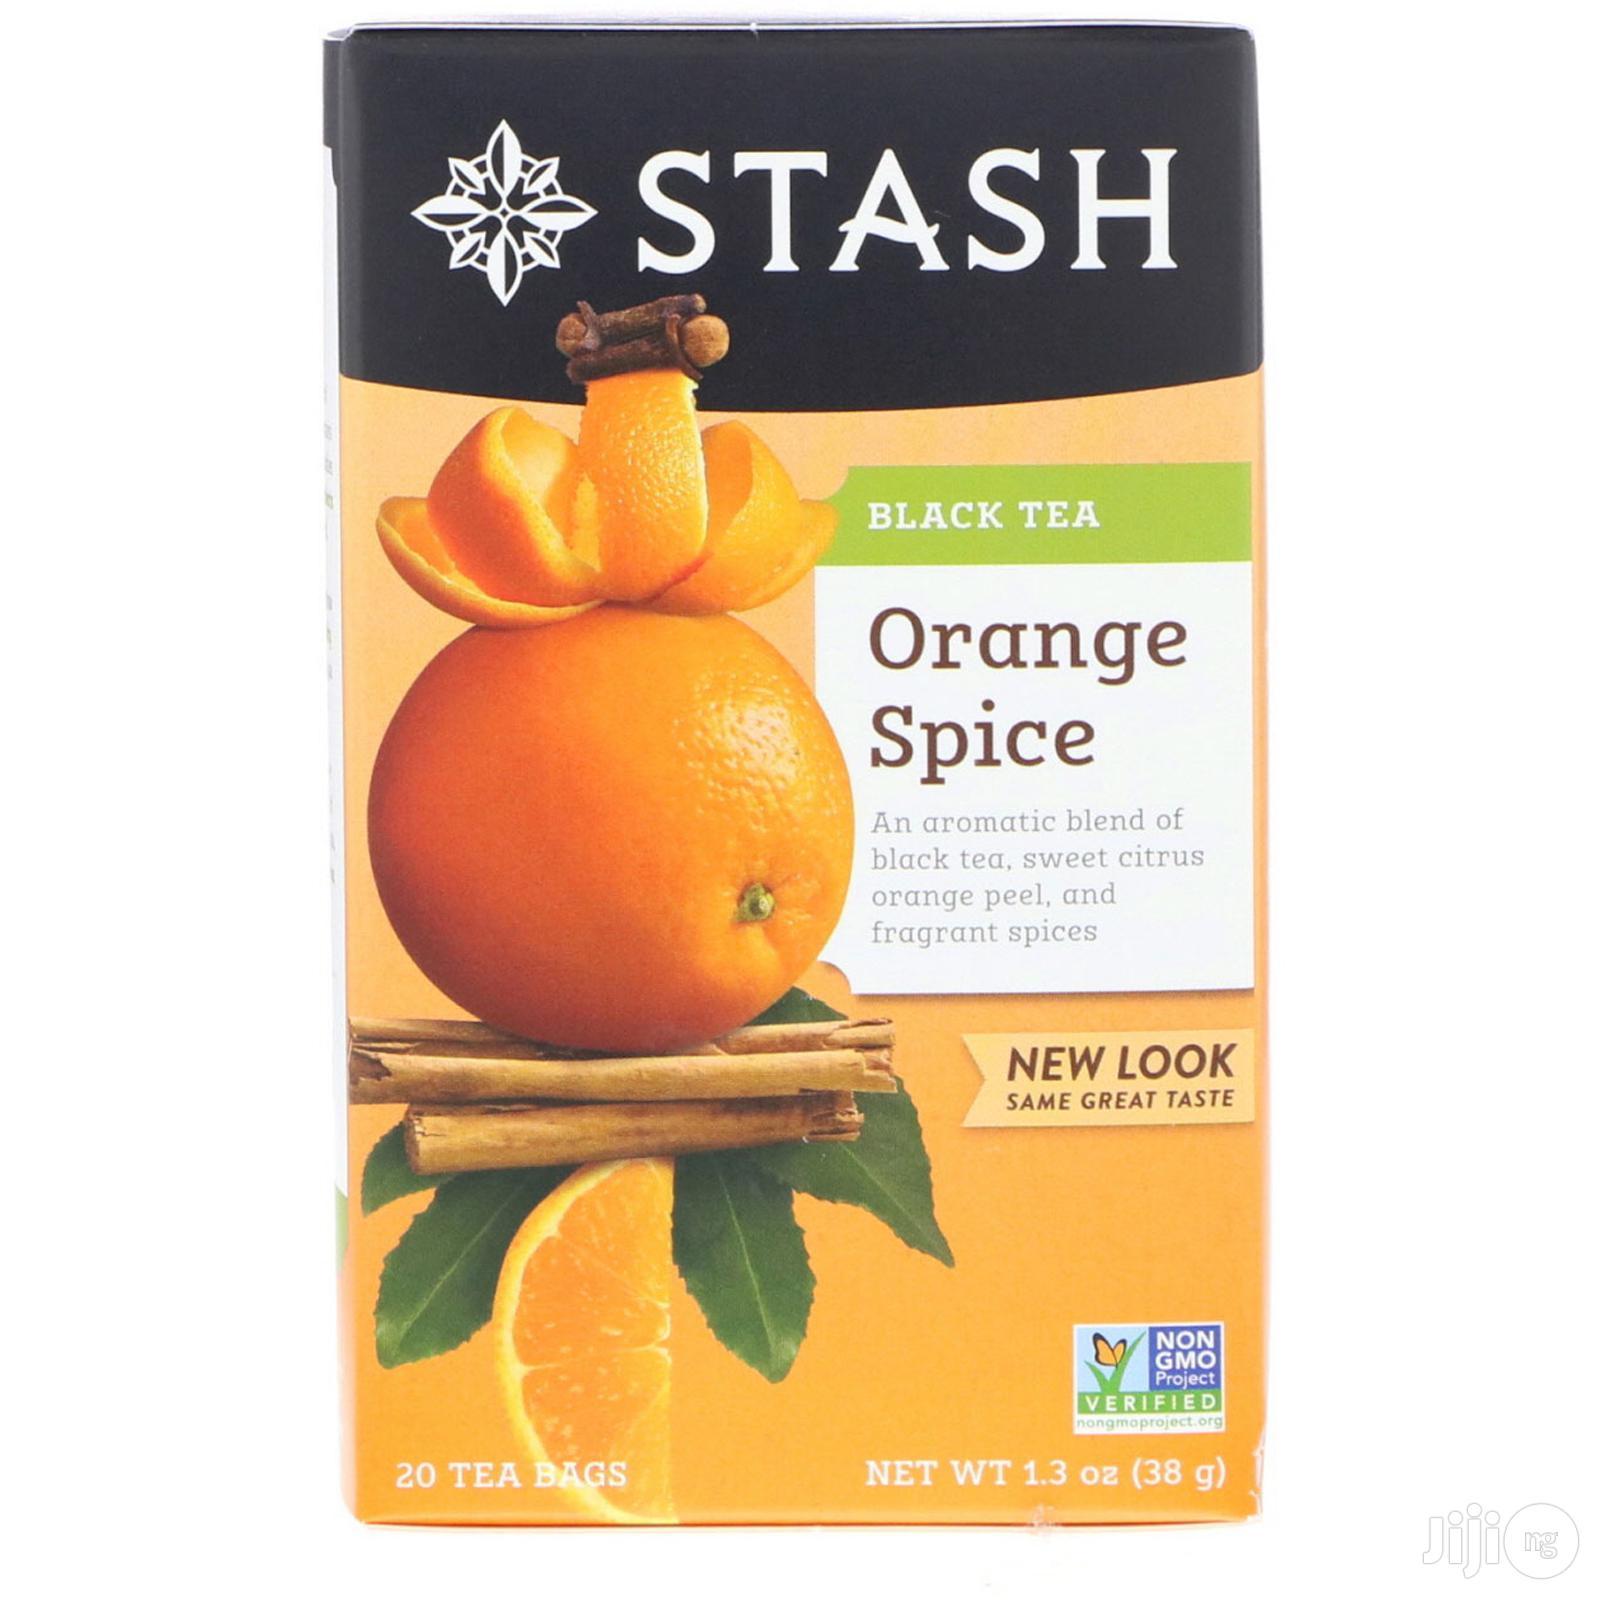 Black Tea, Orange Spice - 20 Tea Bags